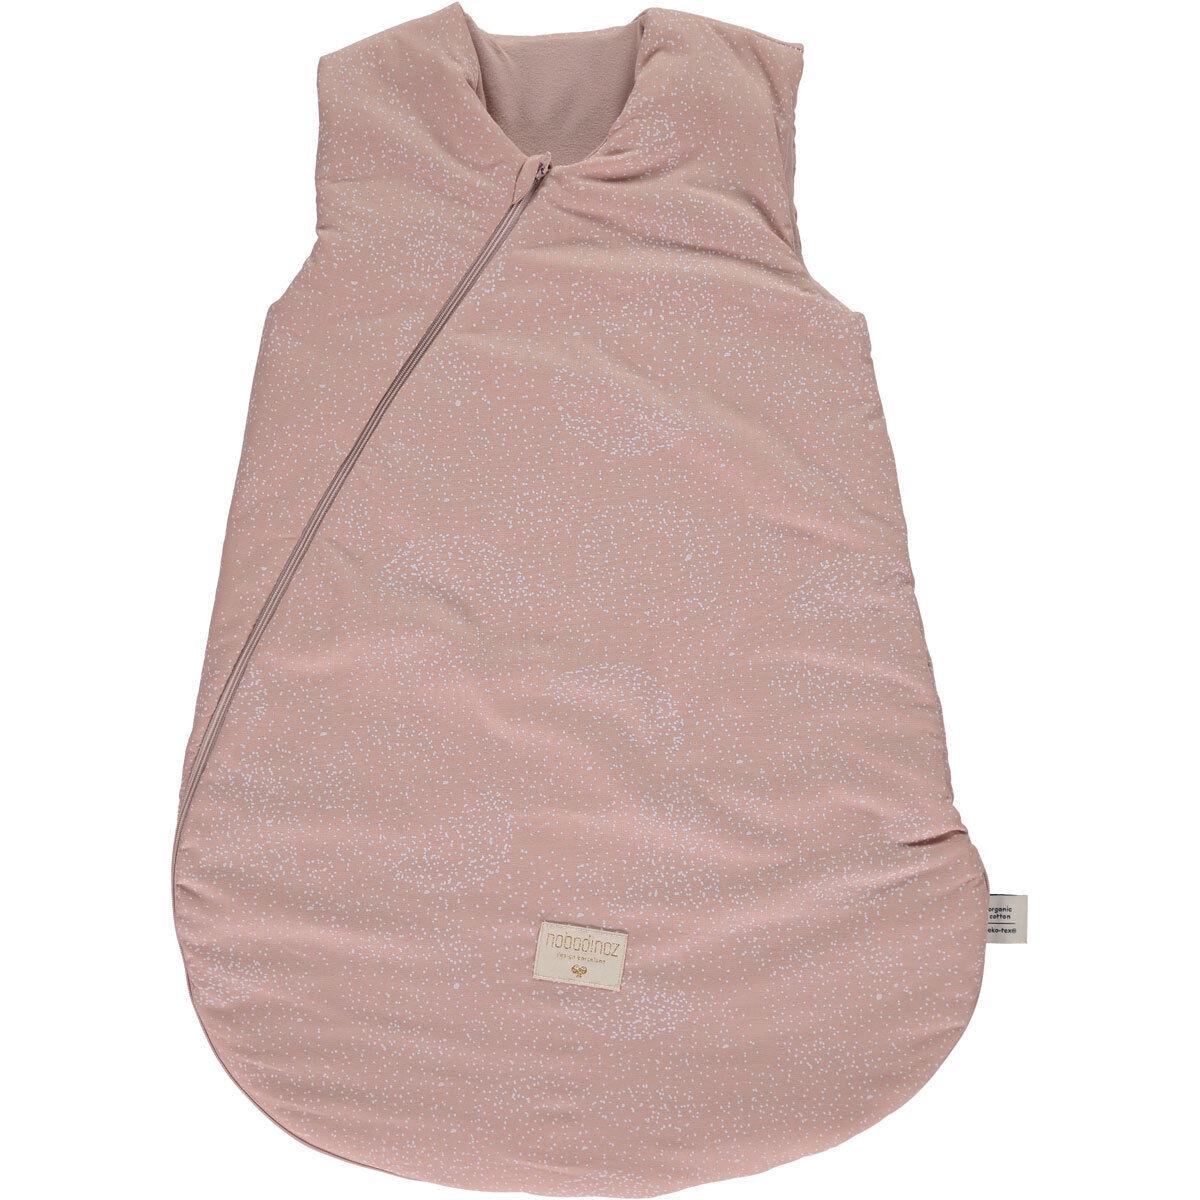 Nobodinoz Gigoteuse Cocoon White Bubble & Misty Pink - 0/6 Mois